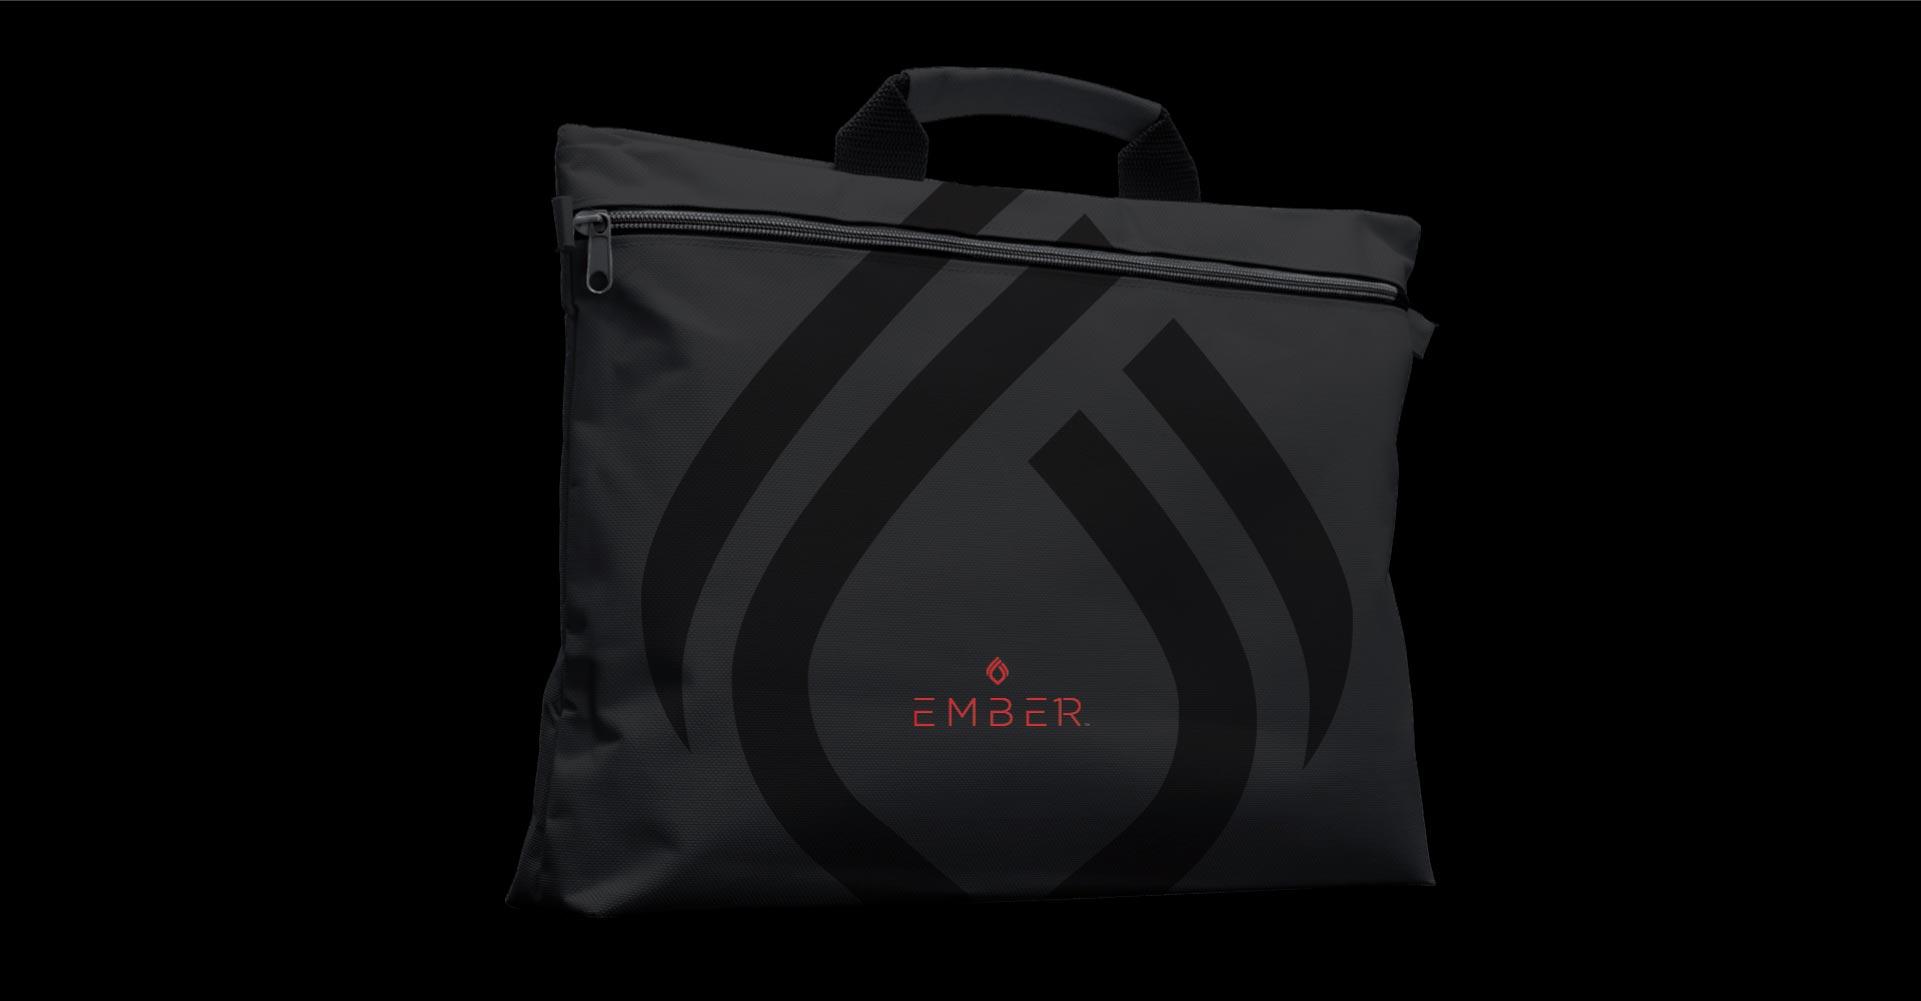 Creative_Retail_Packaging_Branding_Identity_Web_Design_Ember_04.jpg